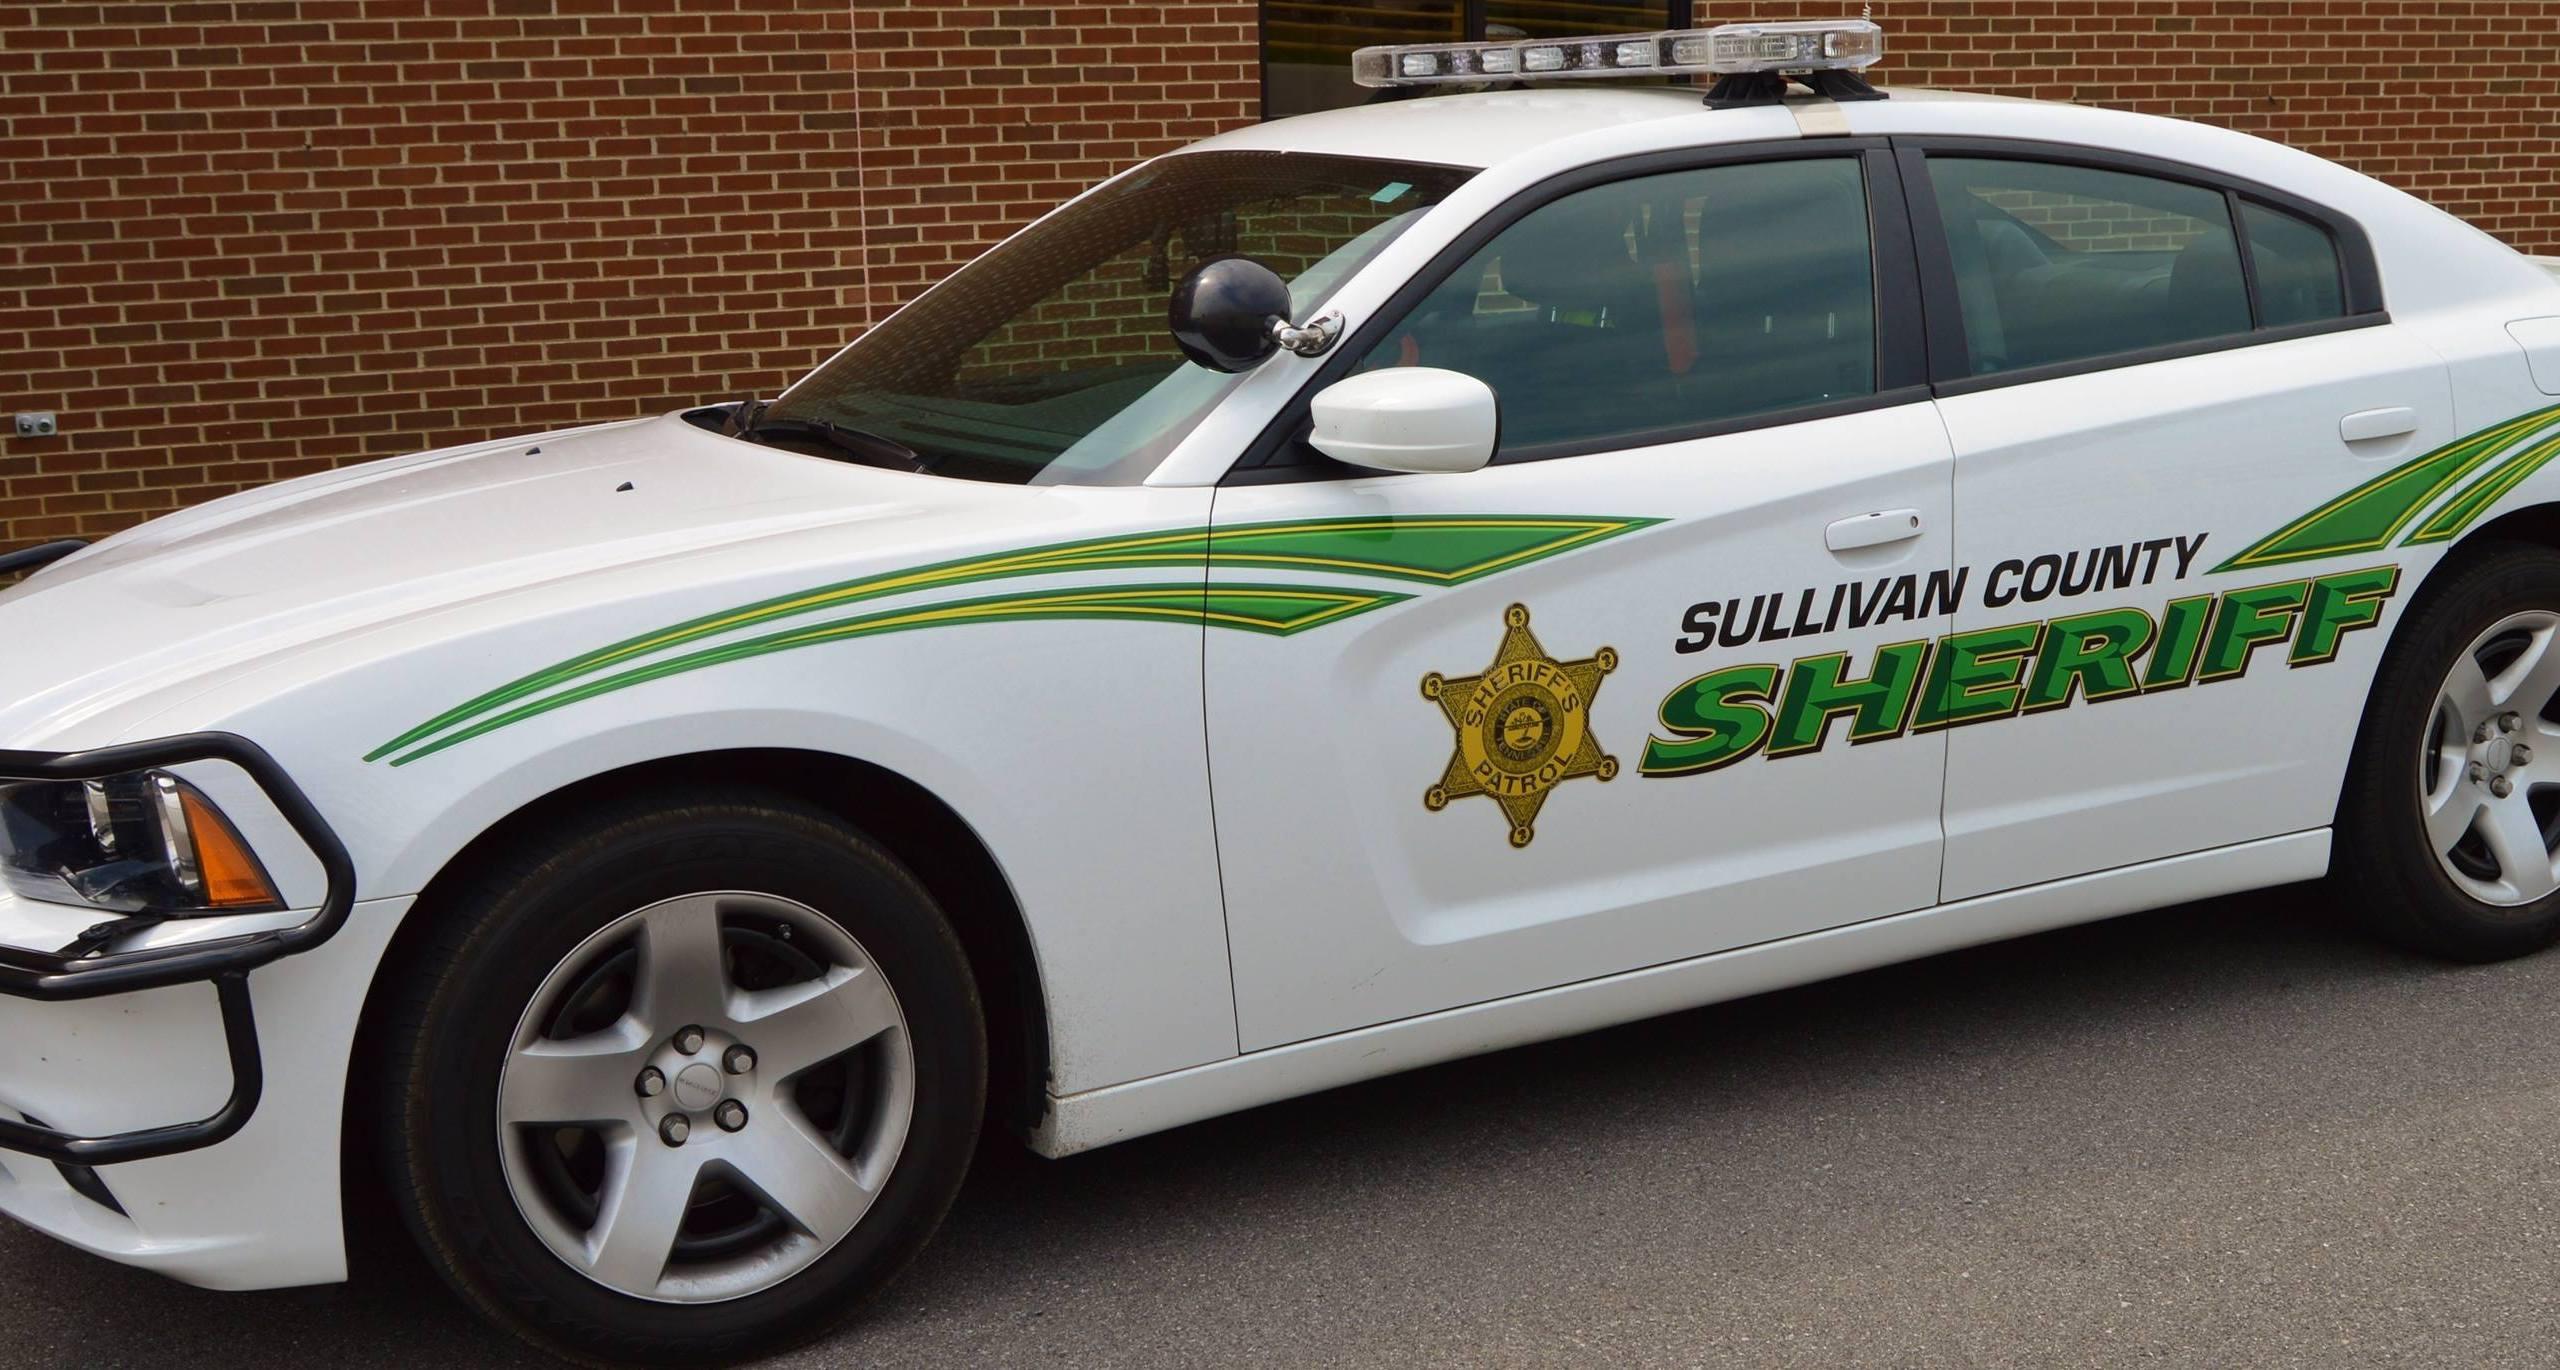 sullivan-county-sheriffs-office-car-source-facebook_213141